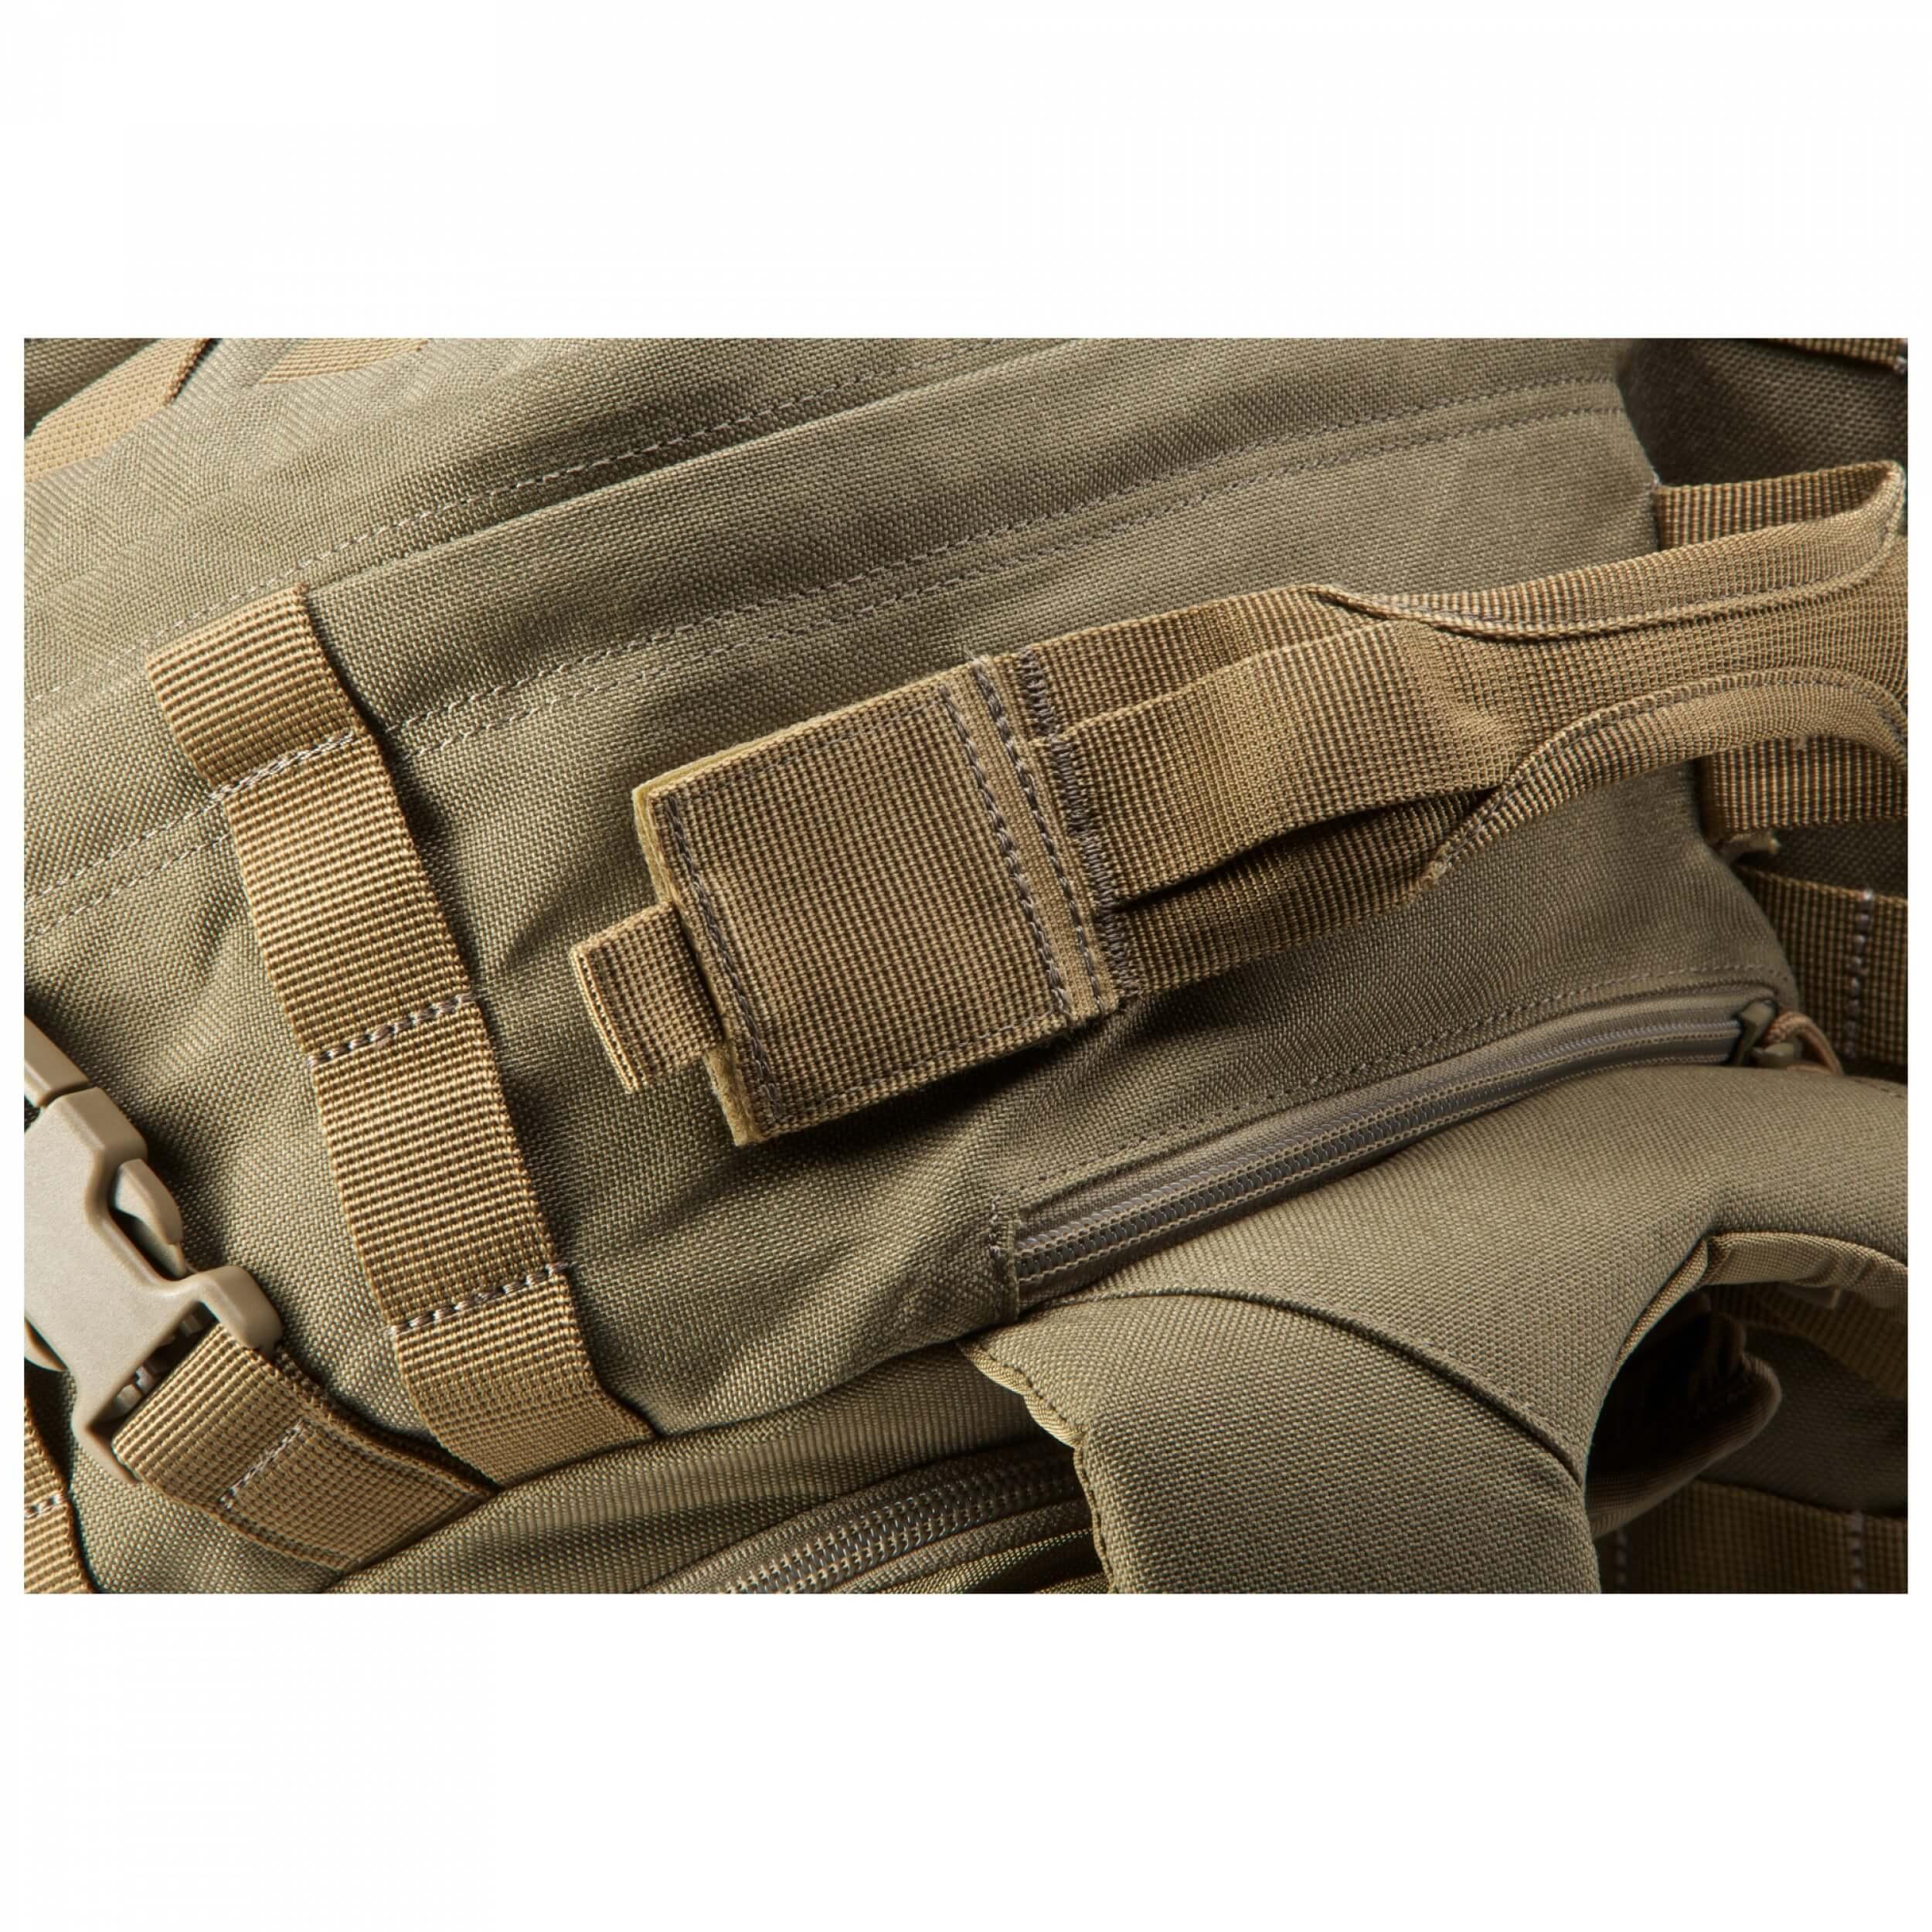 5.11 Tactical Rush 72 Backpack Sandstone